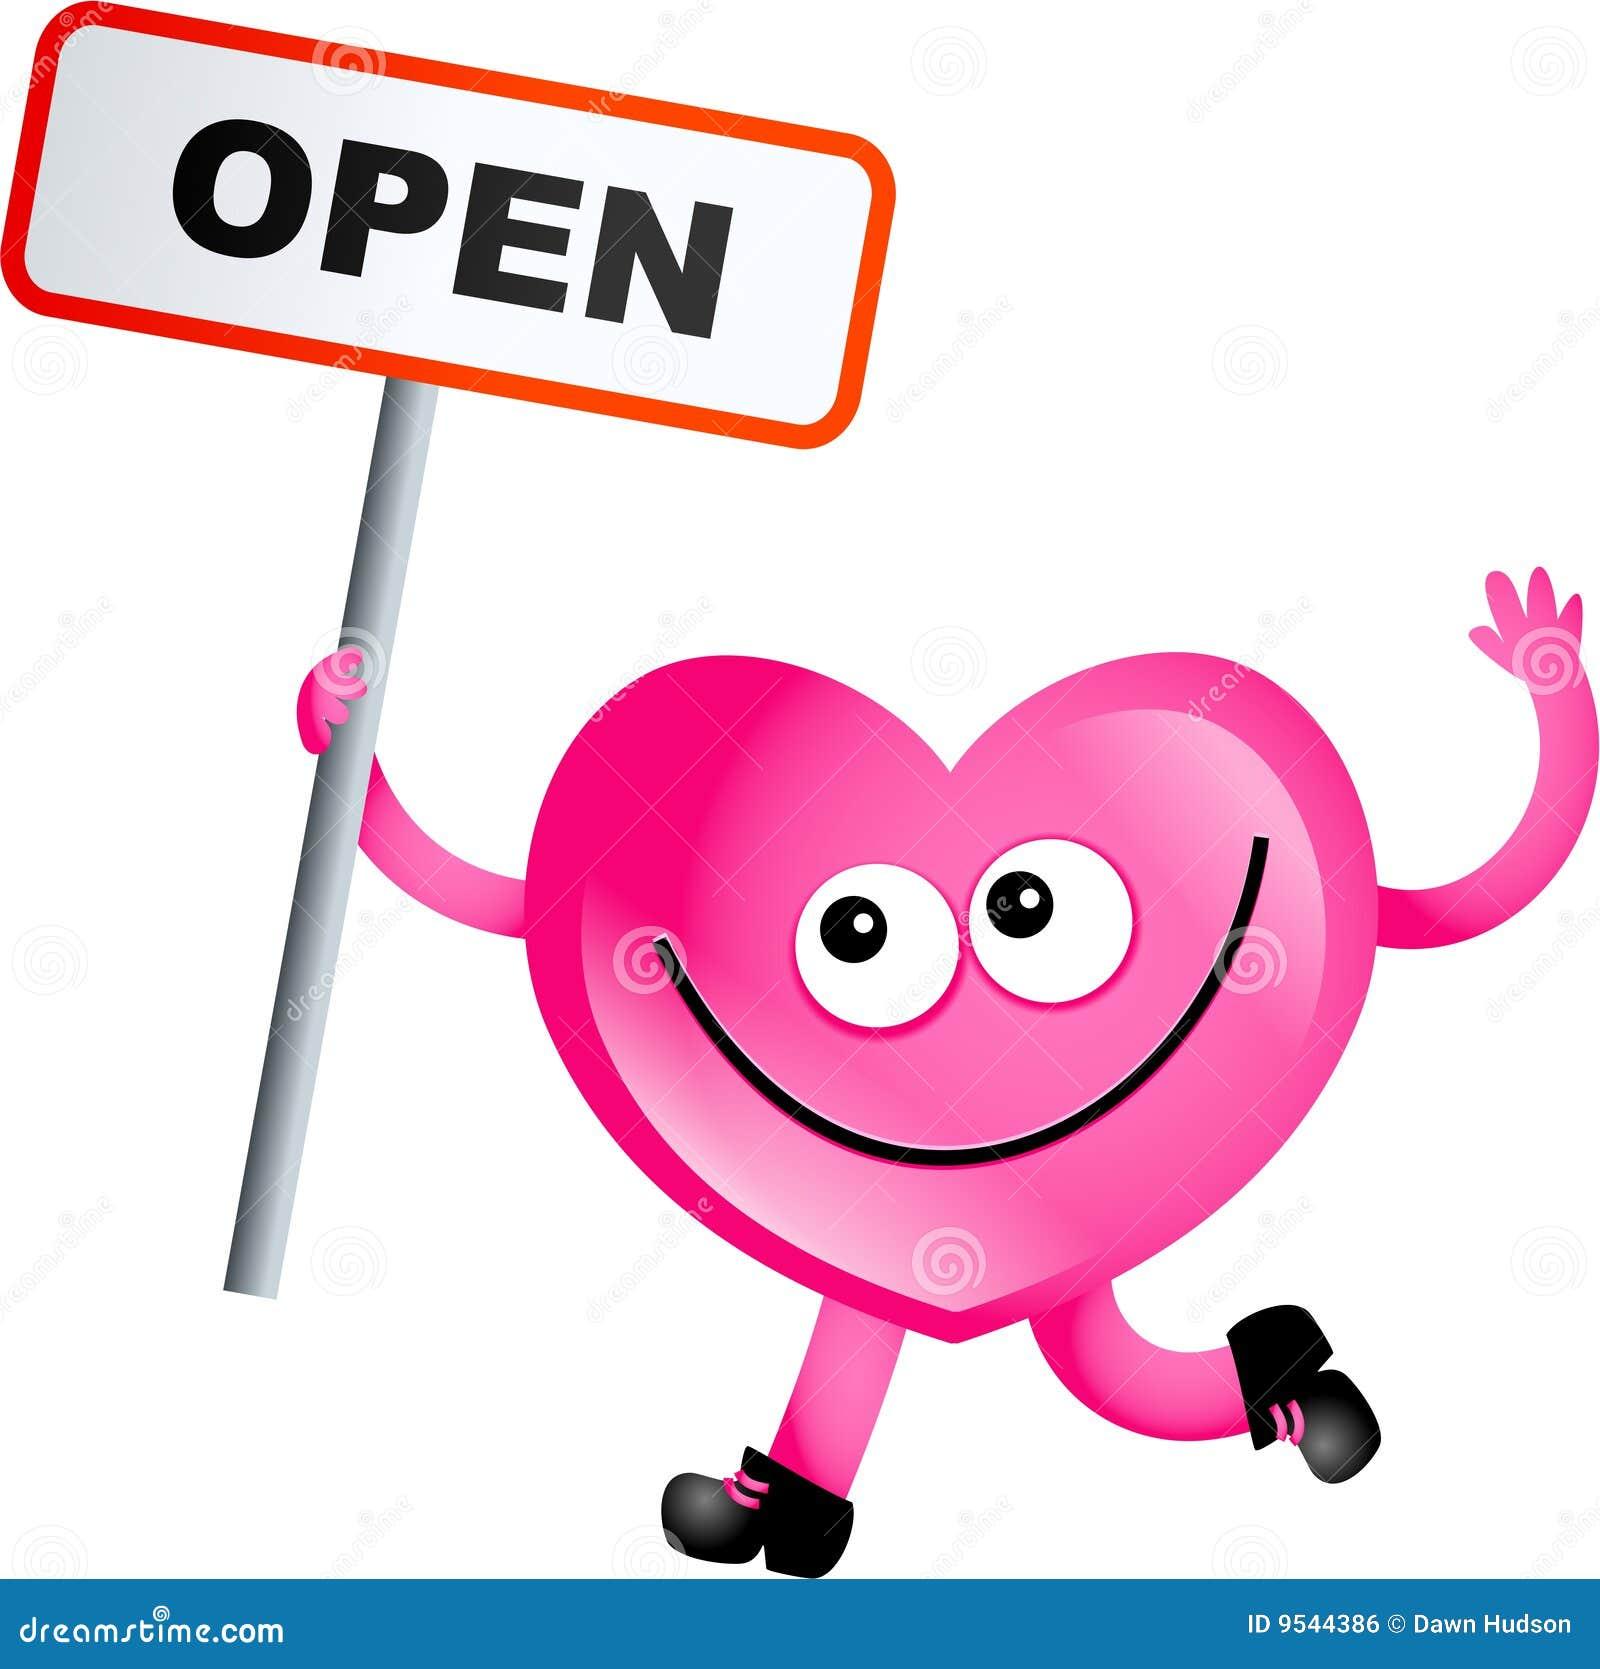 Open liefde